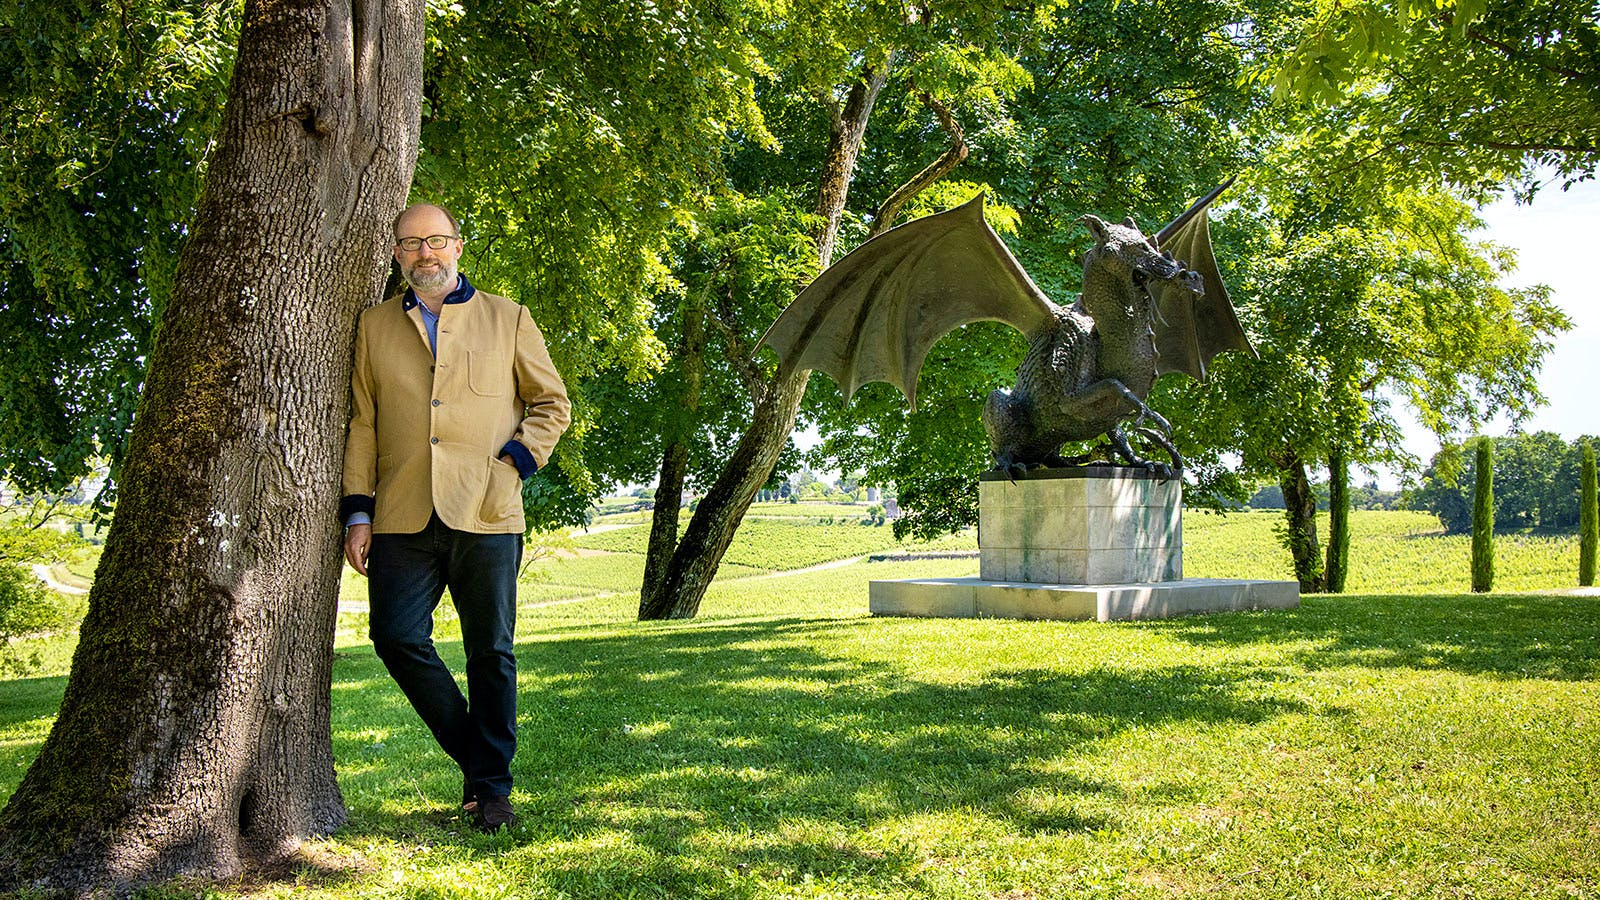 Exclusive: Haut-Brion Owners Expand Plans on Bordeaux's Right Bank, Buy Château Grand-Pontet